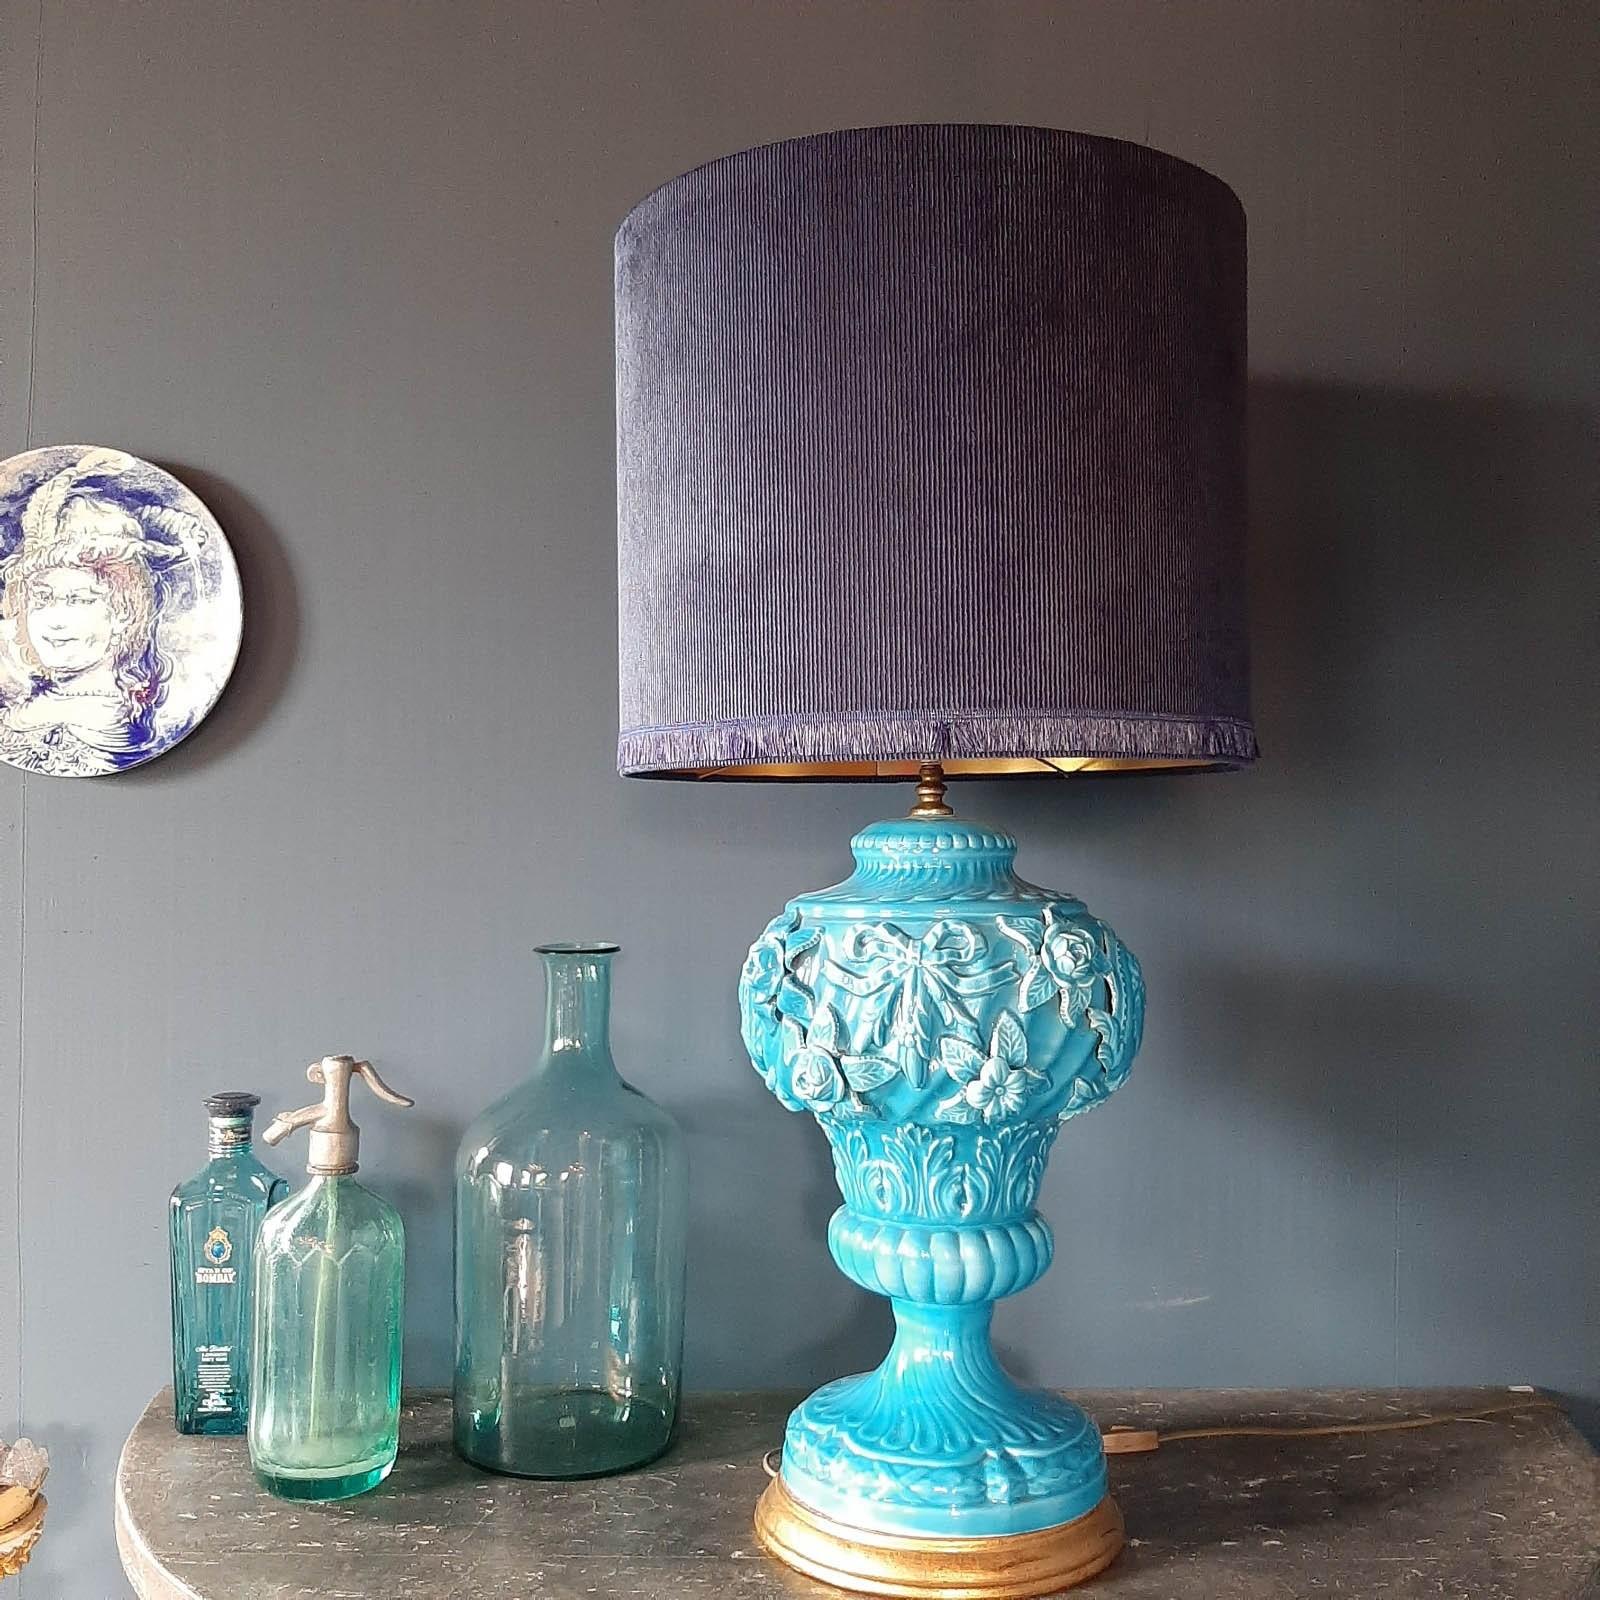 Große Mid-Century Blue Manises Keramik Tischlampe 1950